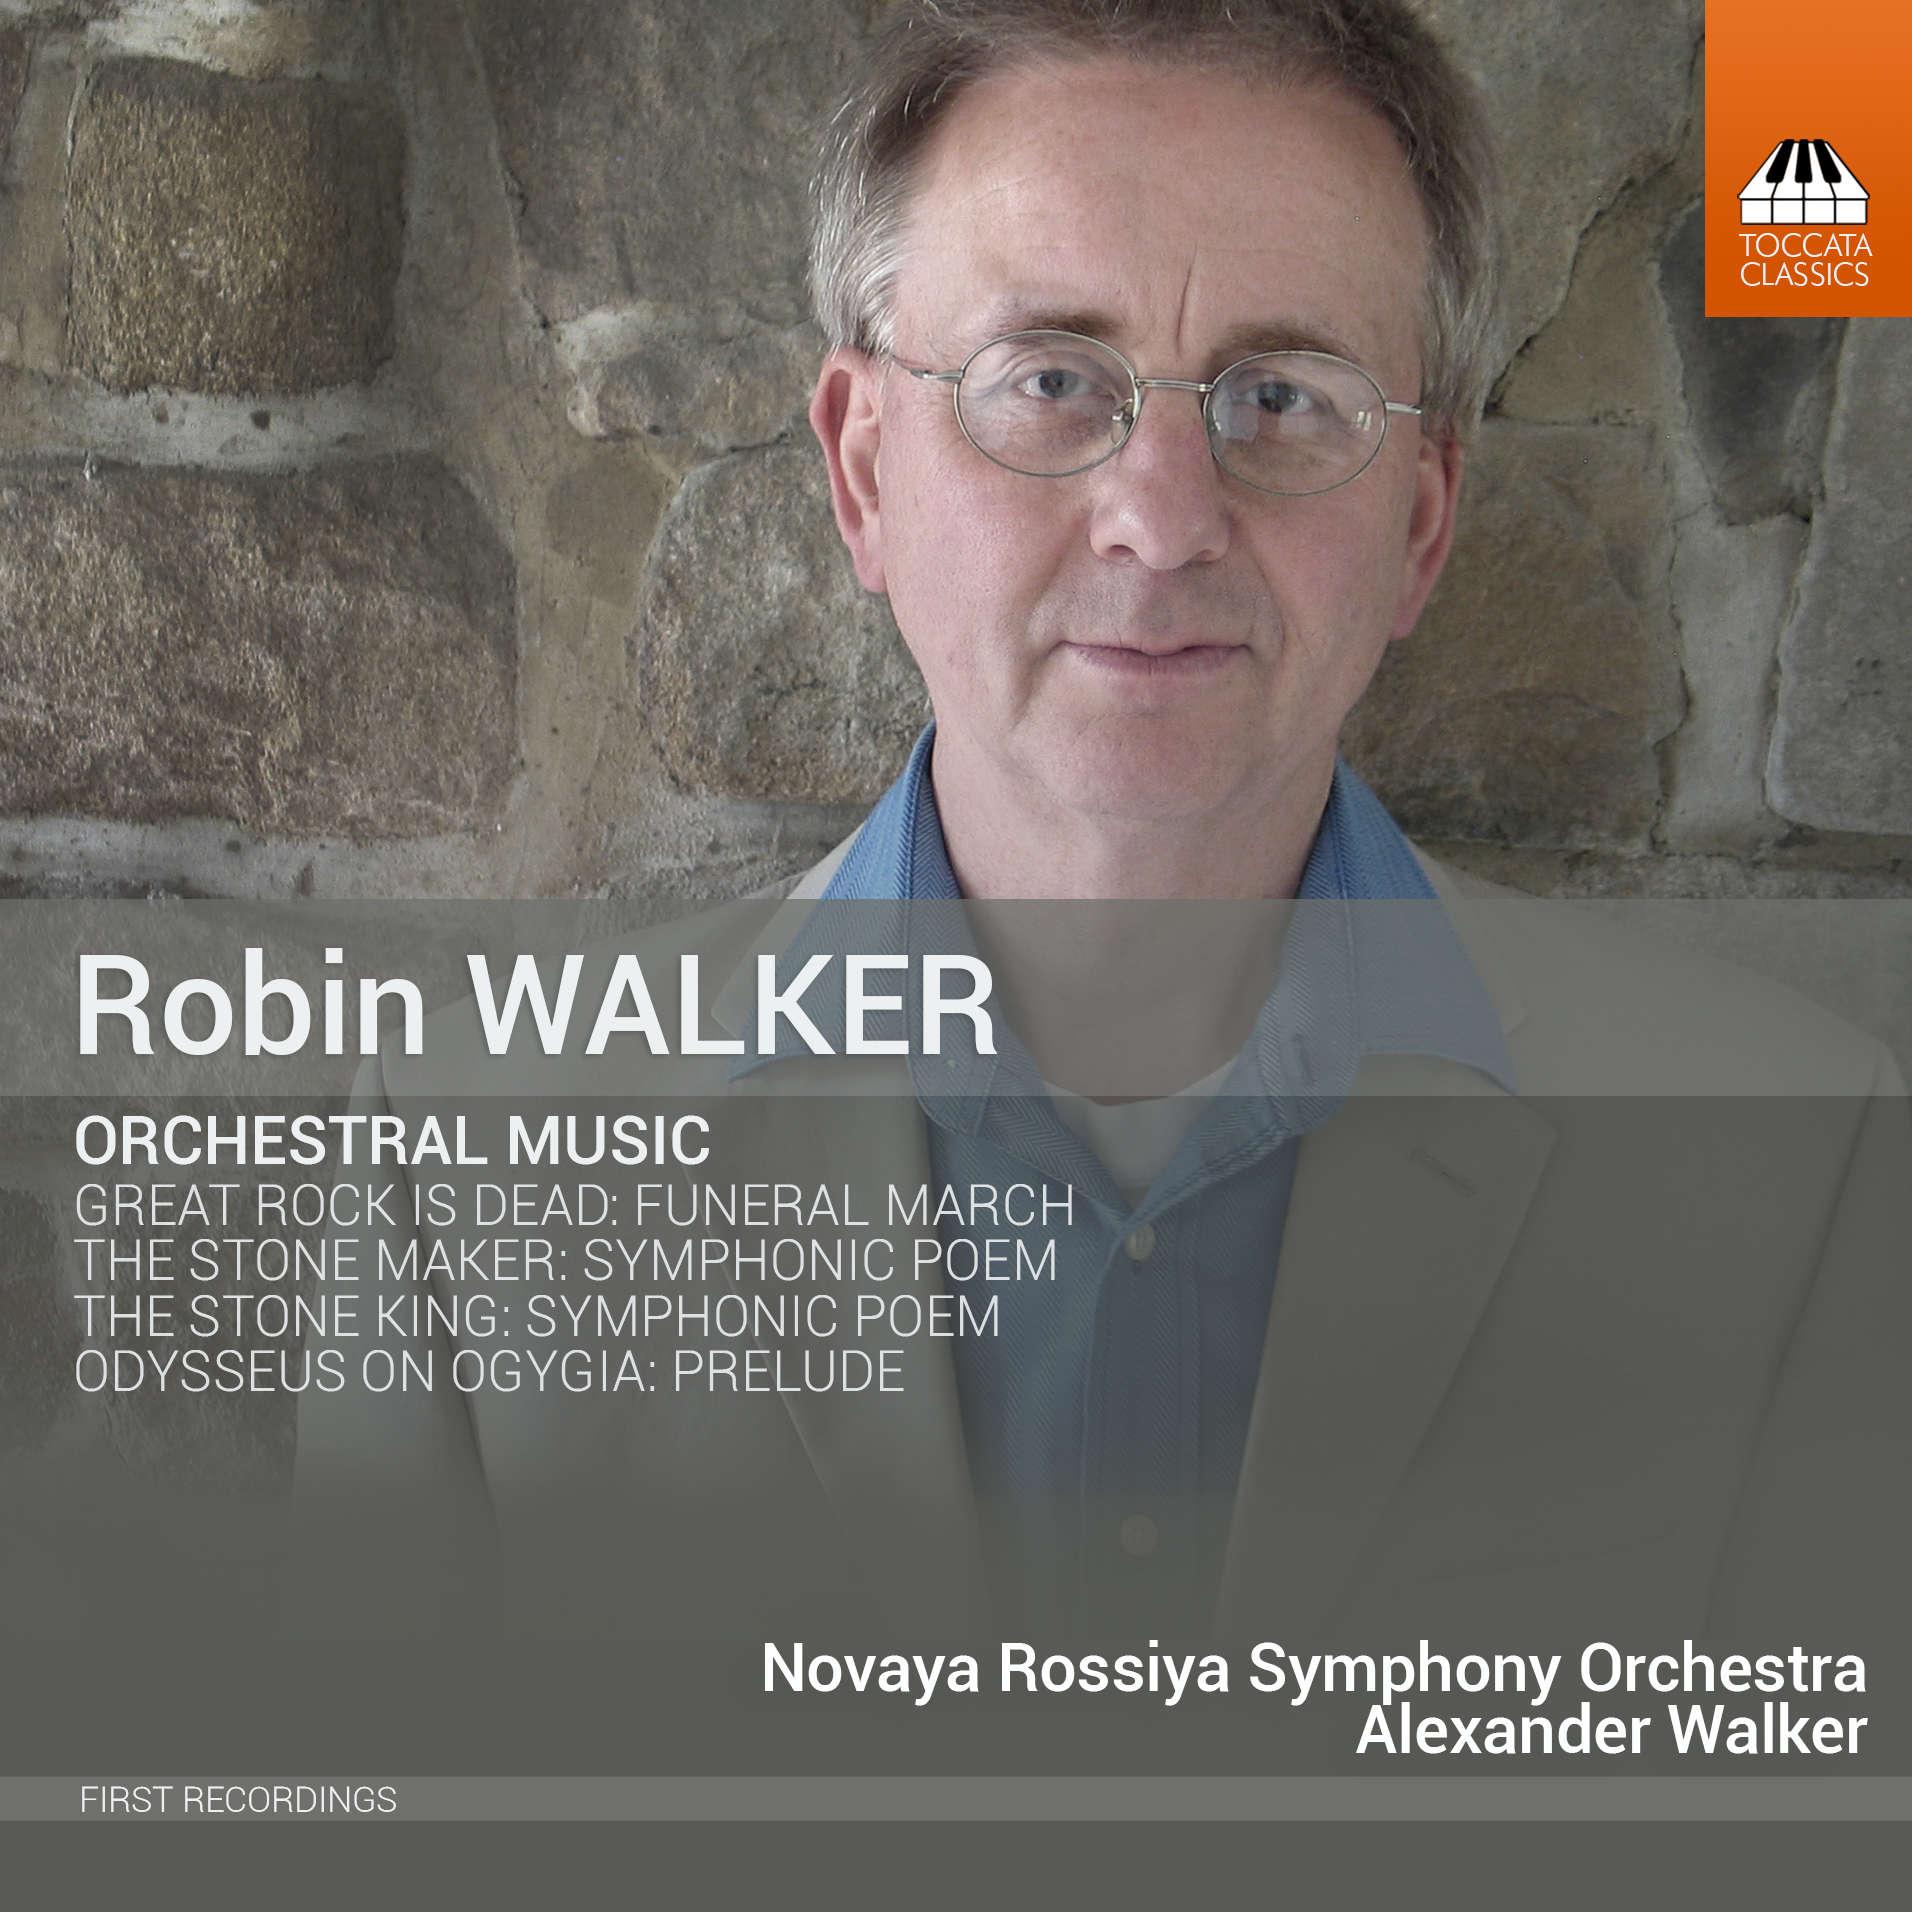 Robin Walker: Orchestral Music